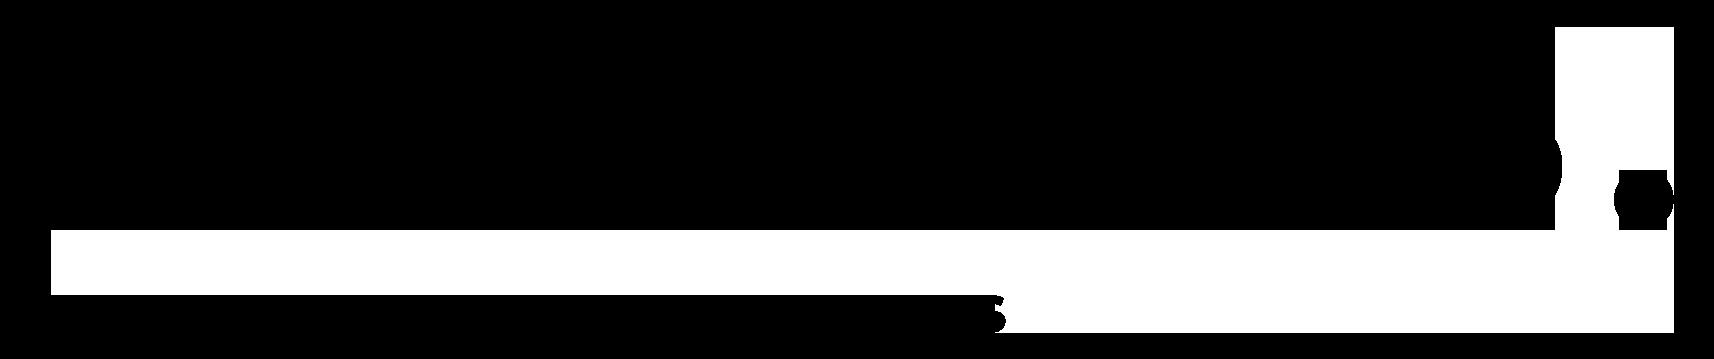 로랩스바이베이비(로랩스, 베이비코스메틱)